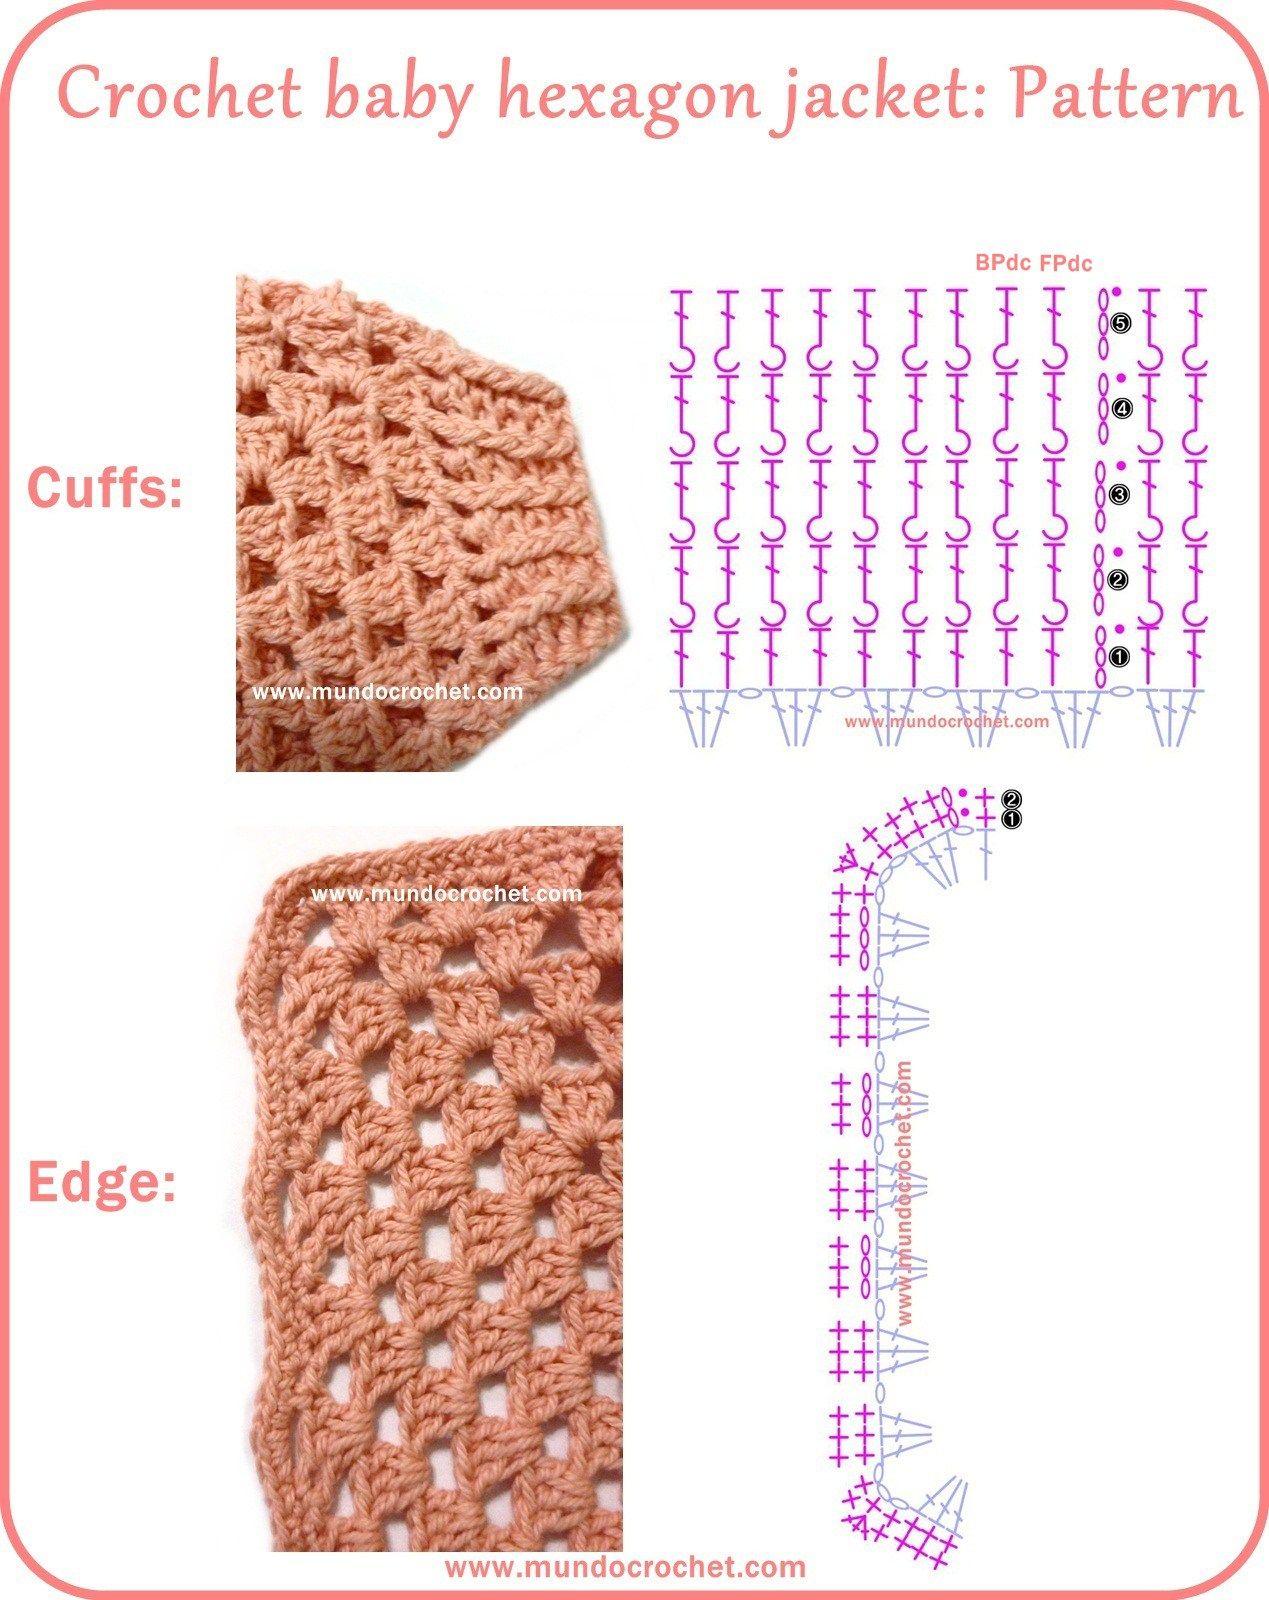 Crochet hexagon jacket / Crochet hexagon sweater | Crochet Charts ...